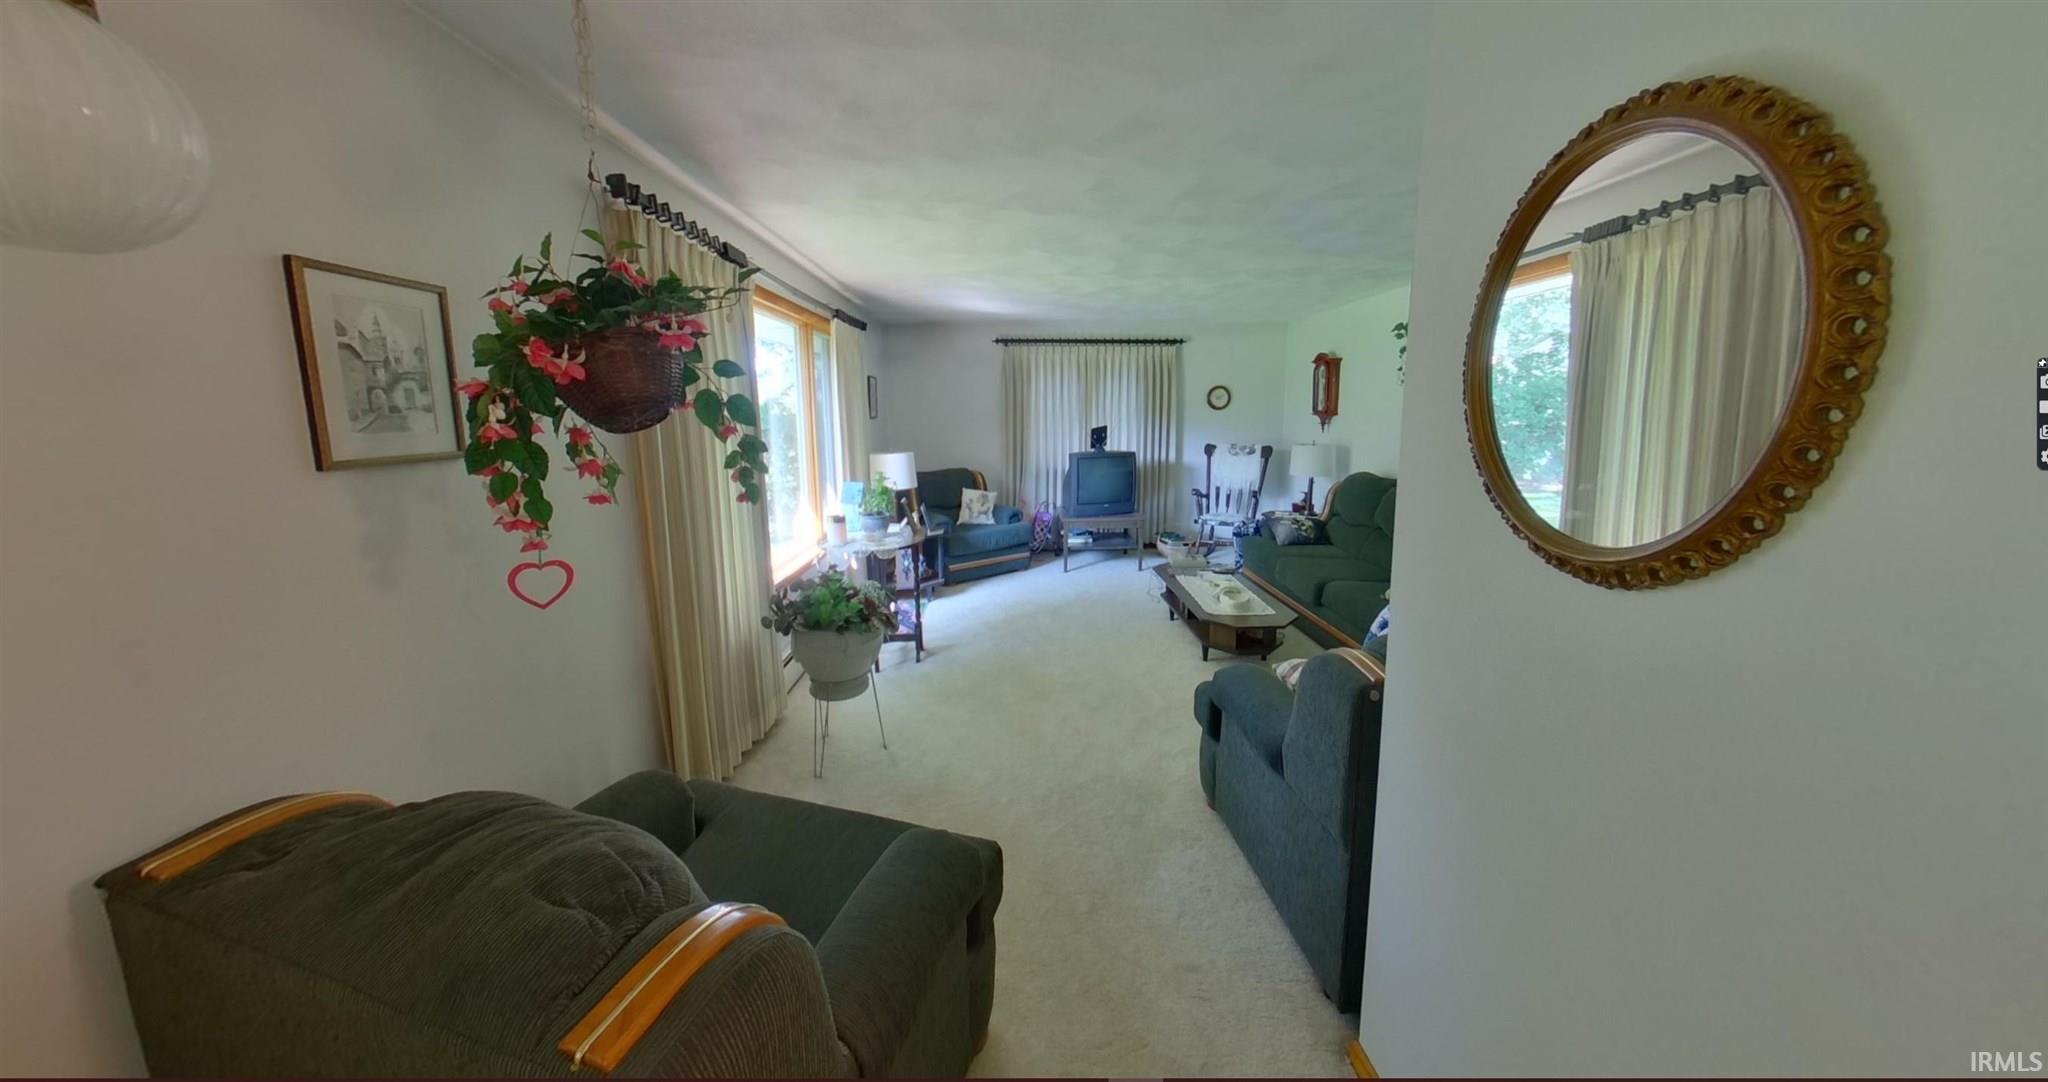 28860 County Road 24 Elkhart, IN 46517